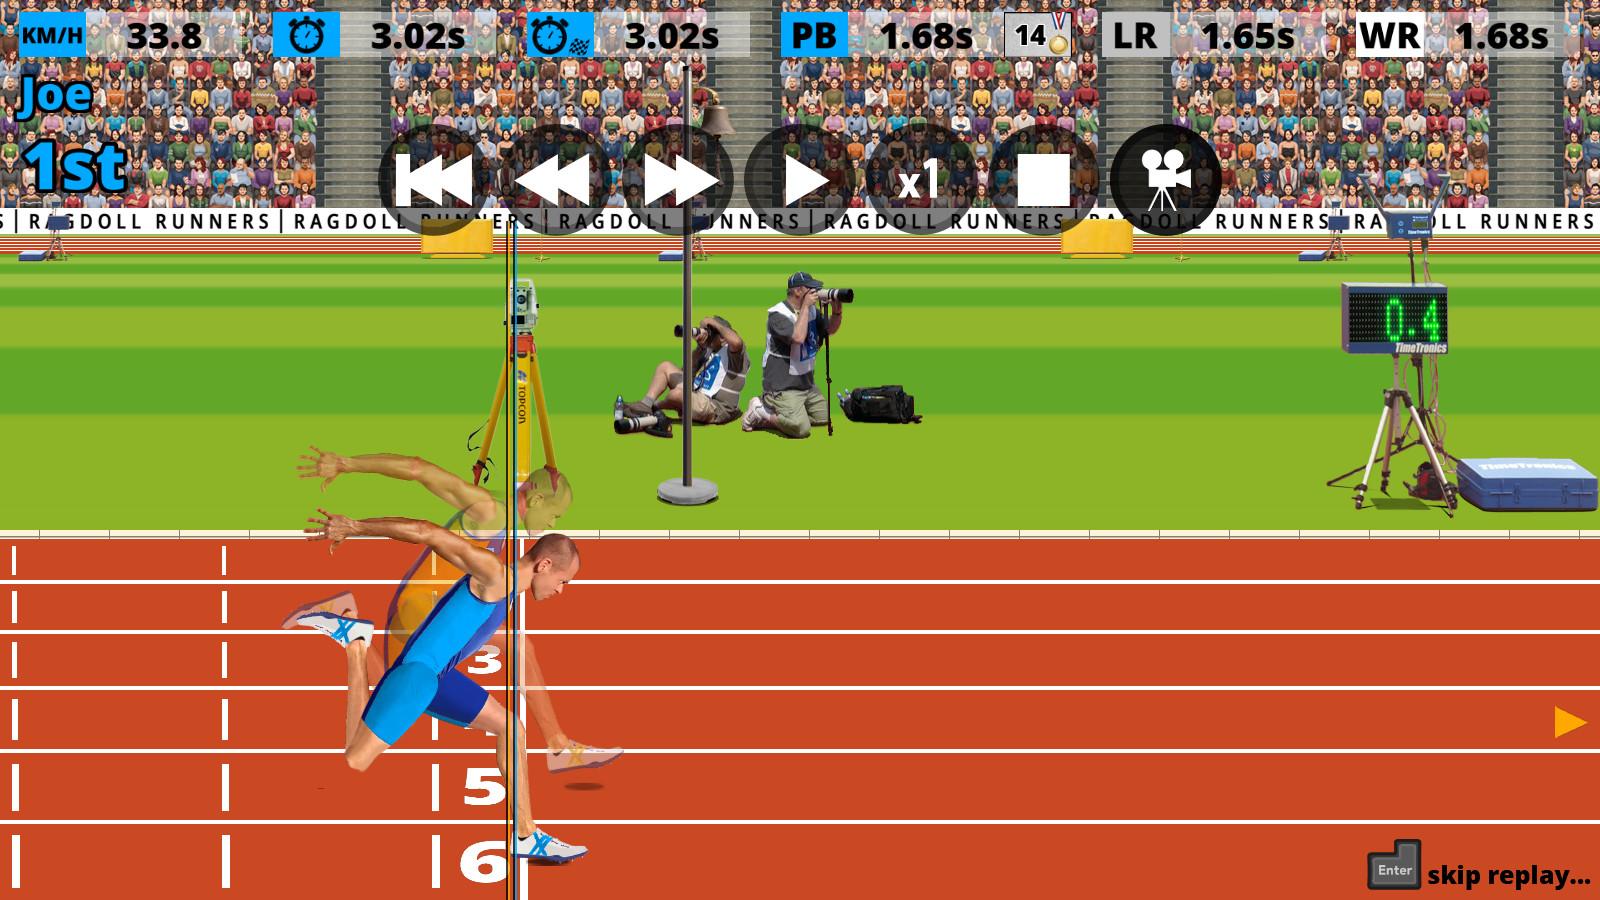 ragdoll runners game